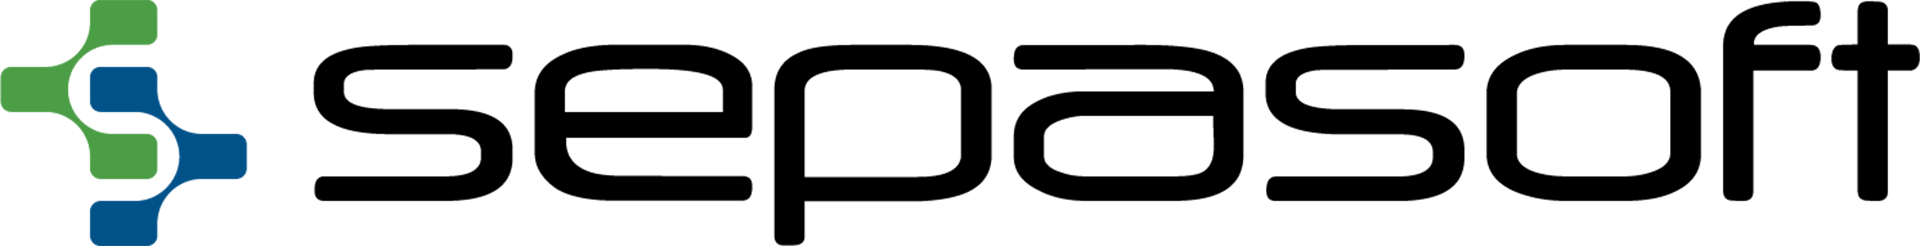 Sepasoft Logo